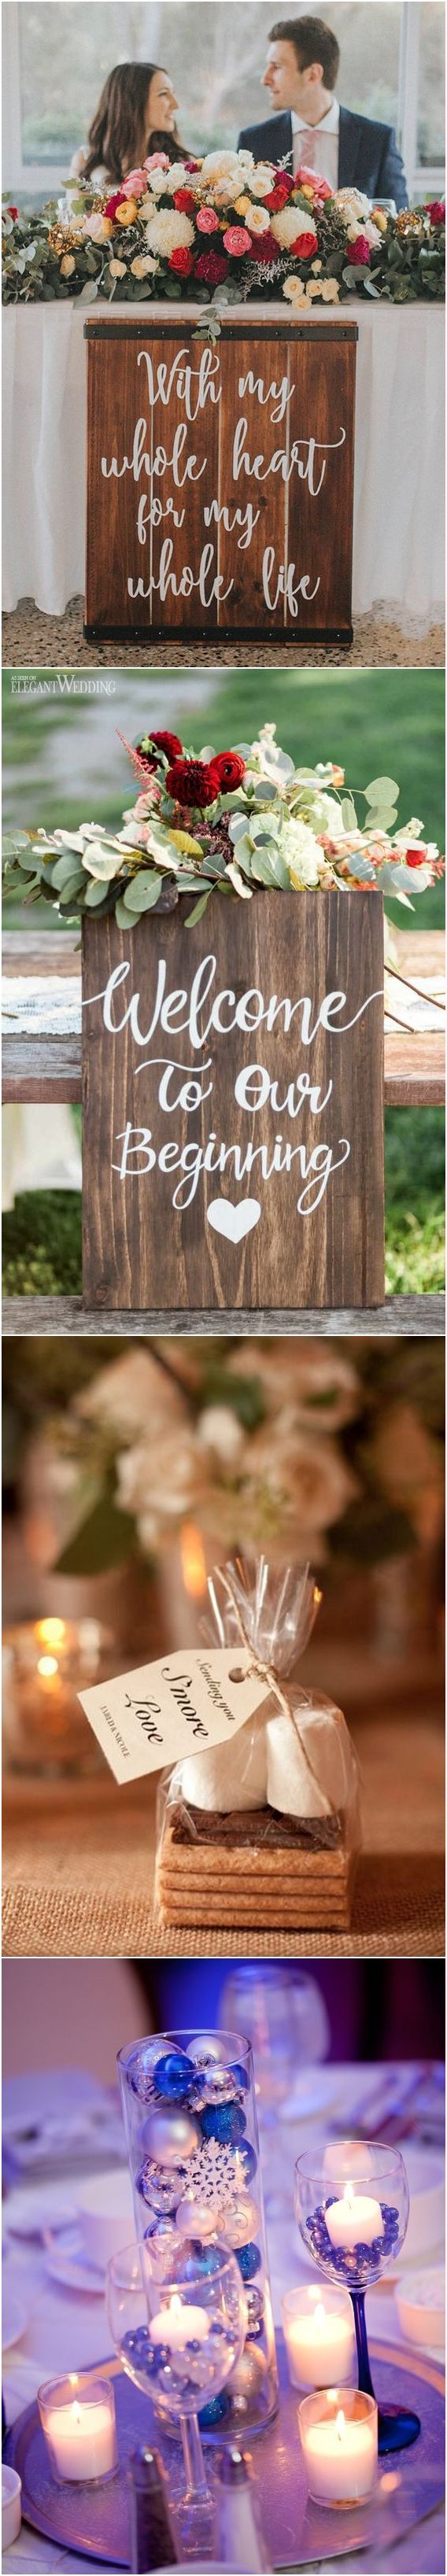 Wedding Quotes Winter wedding ideas winterwedding